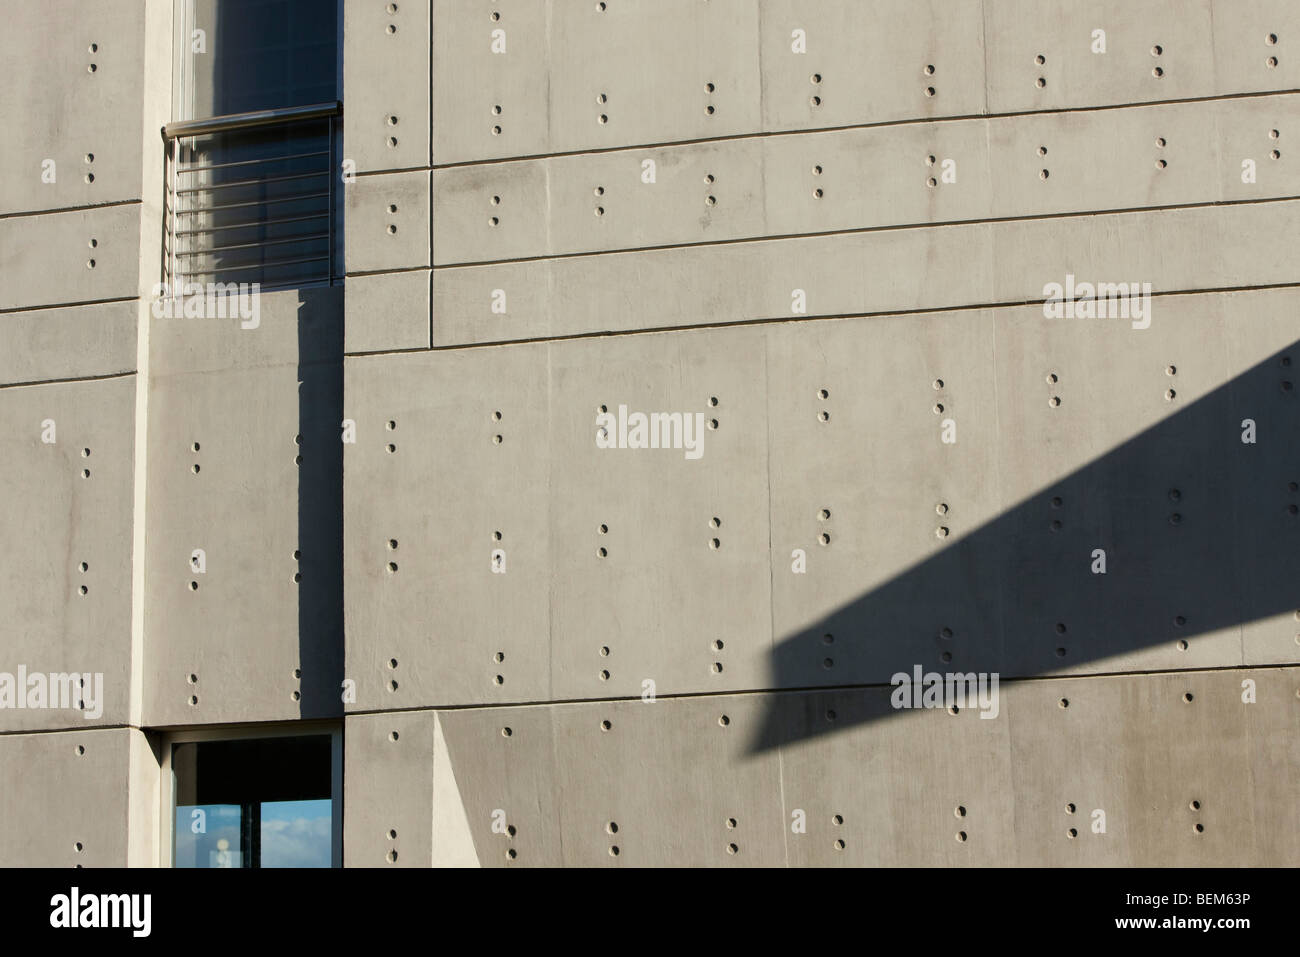 Facade of contemporary building - Stock Image